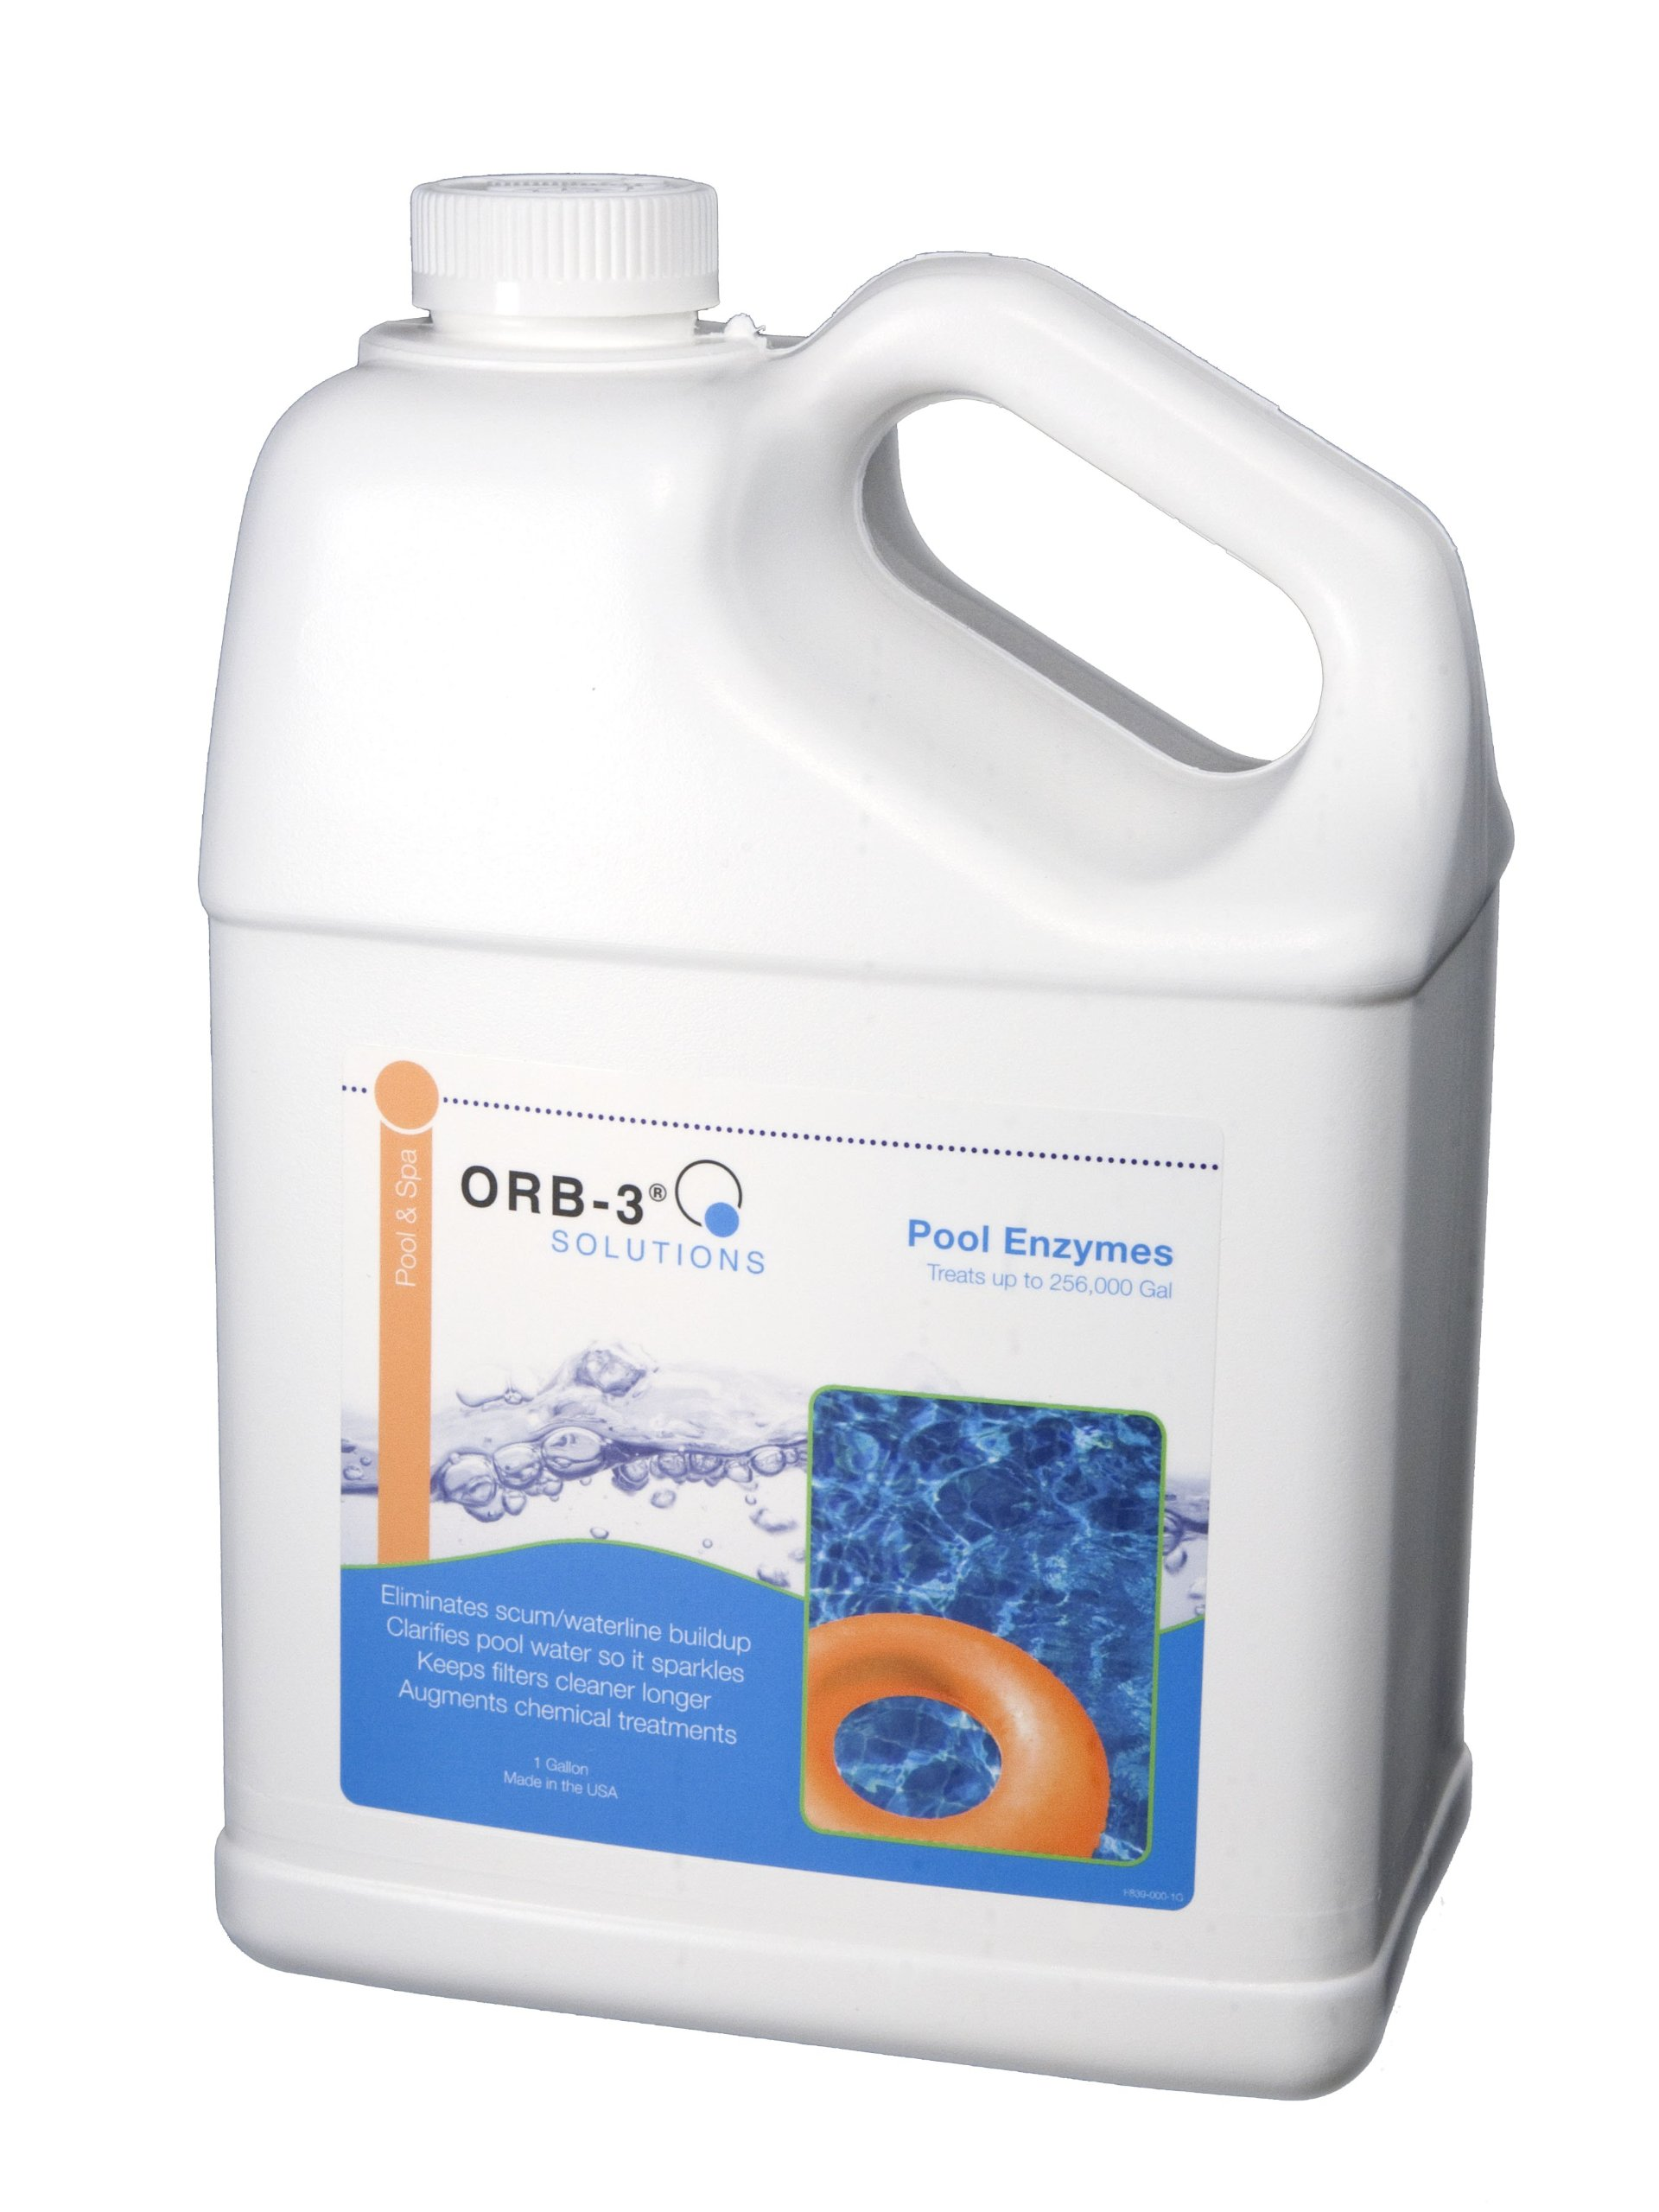 Orb-3 F839-000-1G Pool Enzymes Jug, 1-Gallon by Orb-3